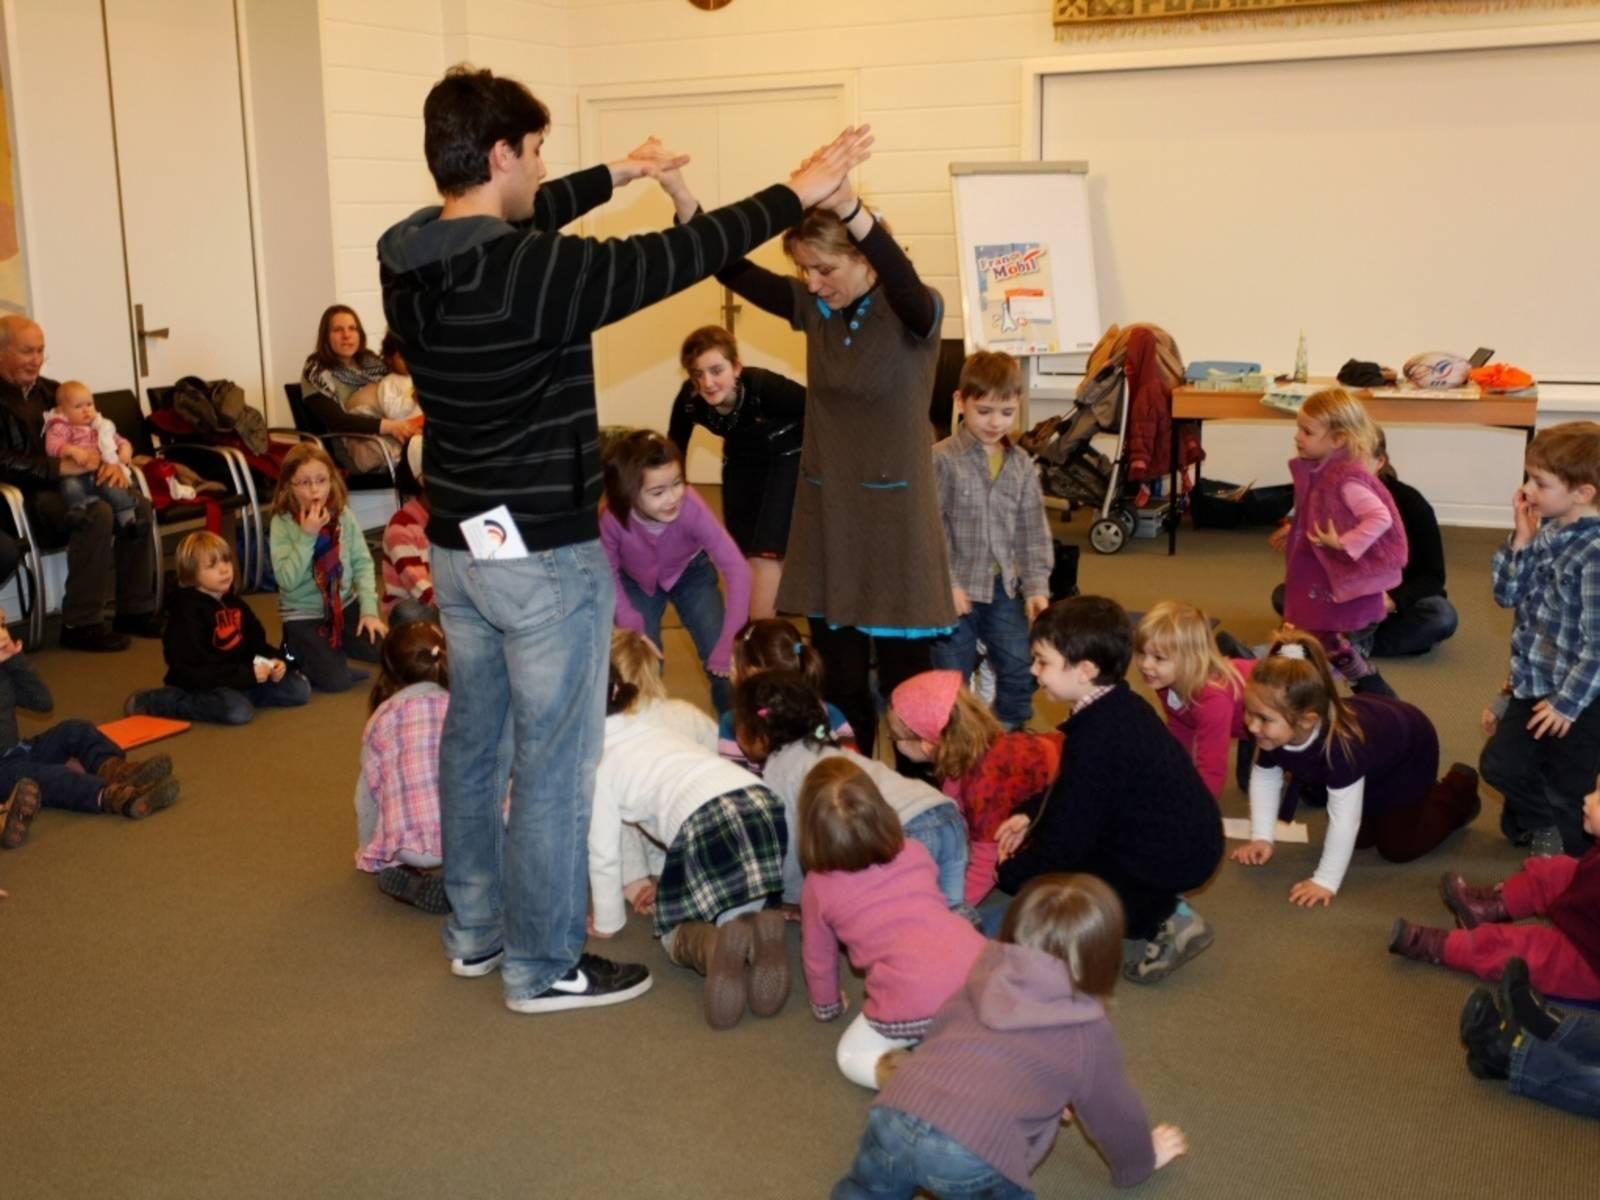 Kreativer Kindertanz im Bürgerhaus